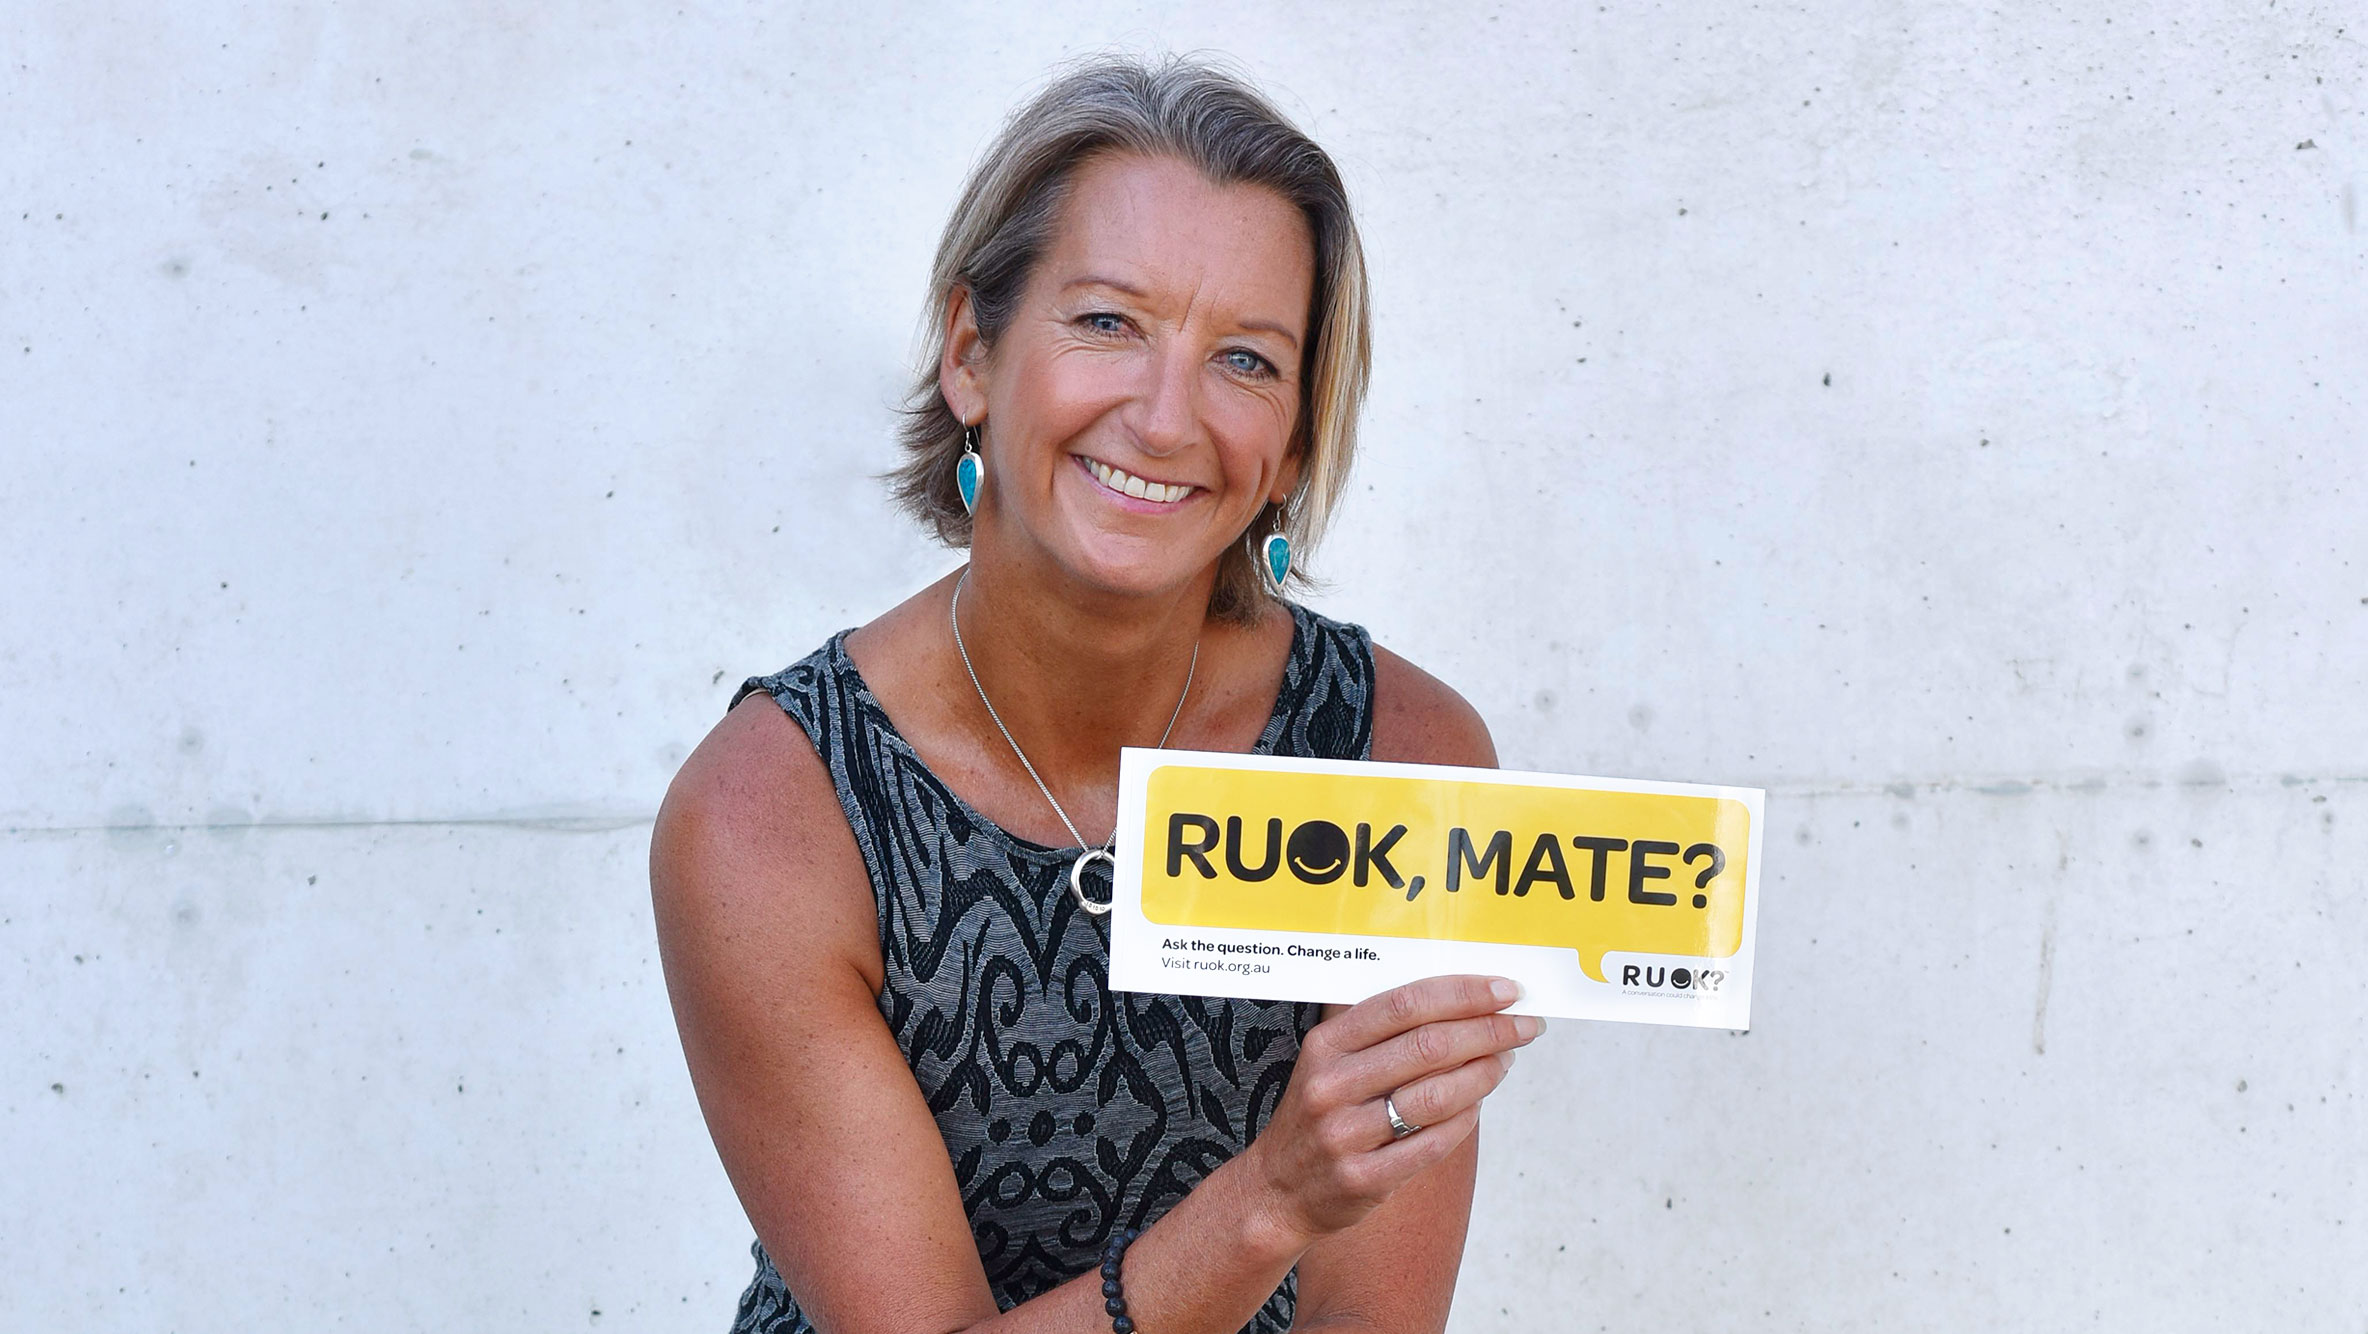 R U OK? Hero with Layne Beachley holding up a speech bubble with R U OK?